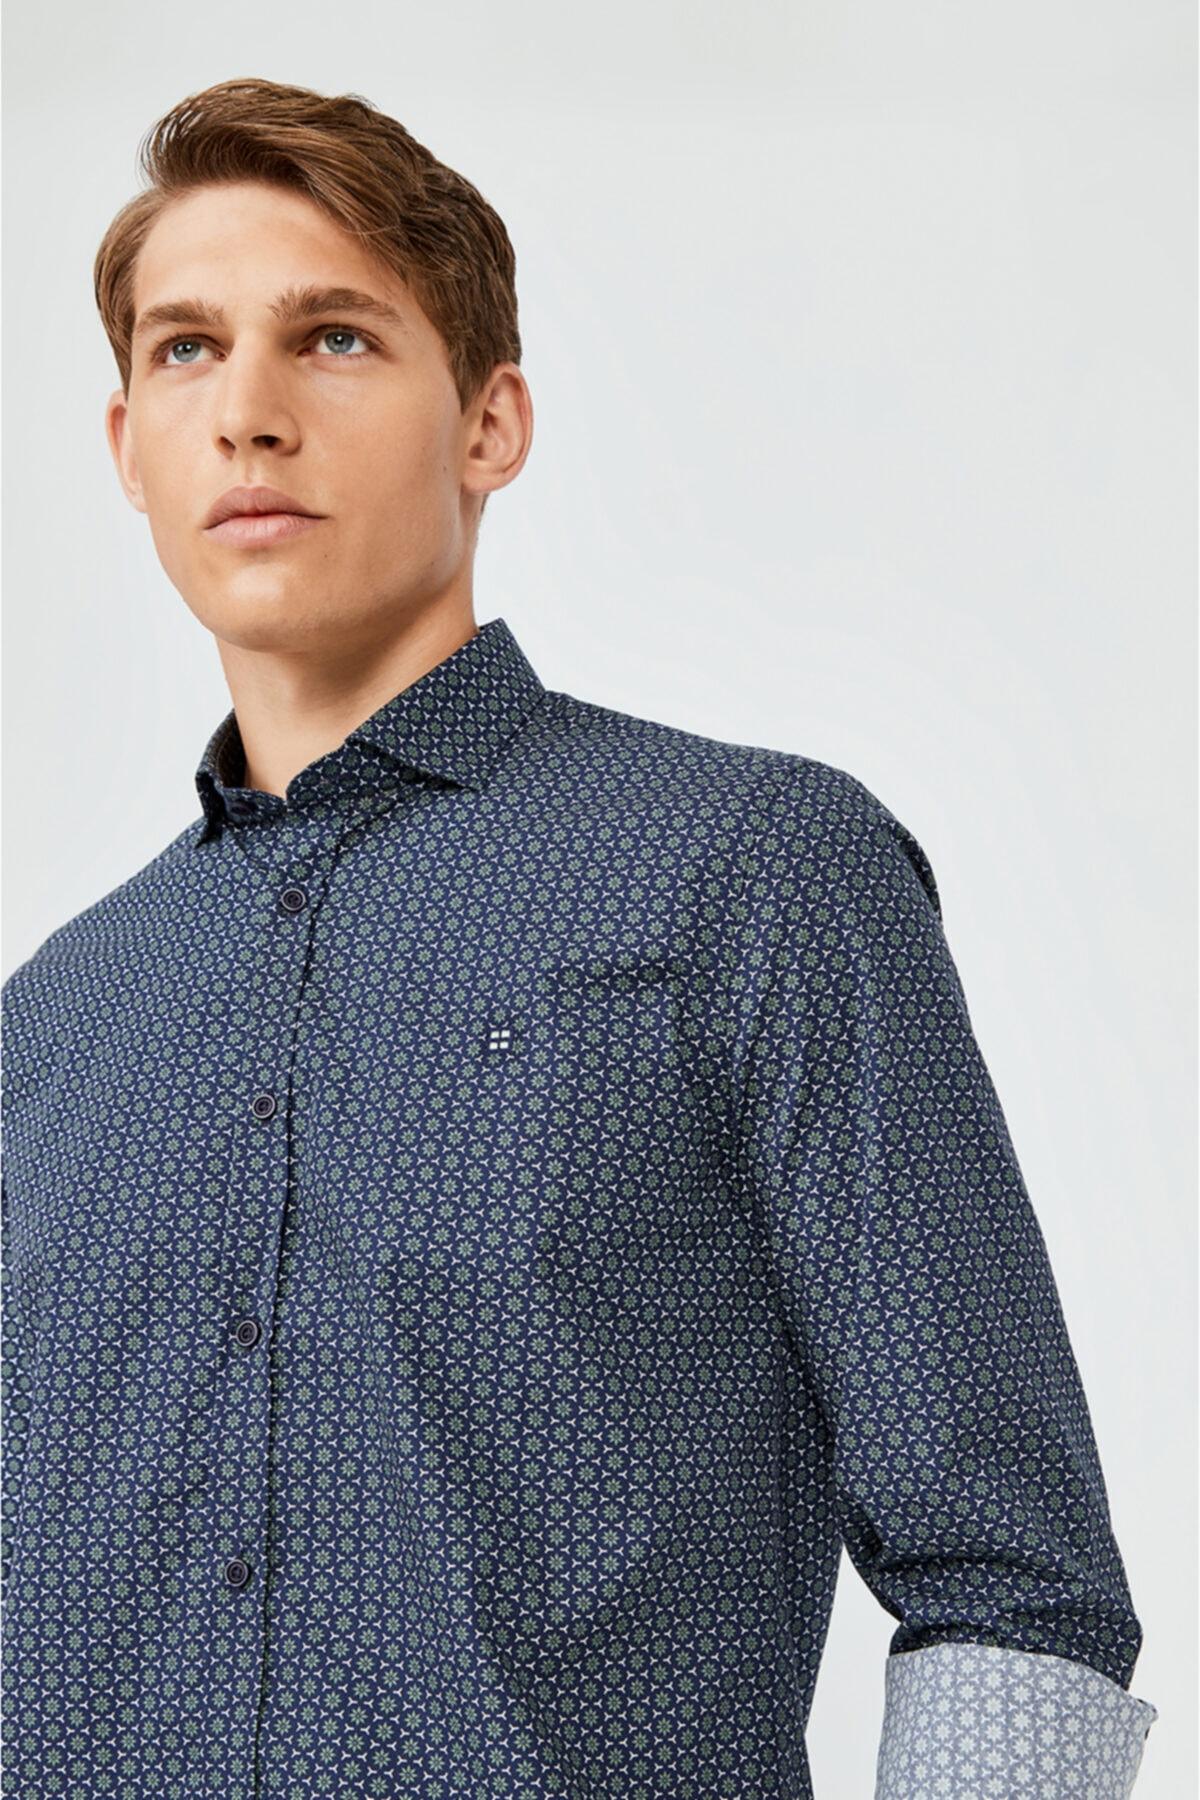 Erkek Lacivert Baskılı Alttan Britli Yaka Slim Fit Gömlek A02y2073